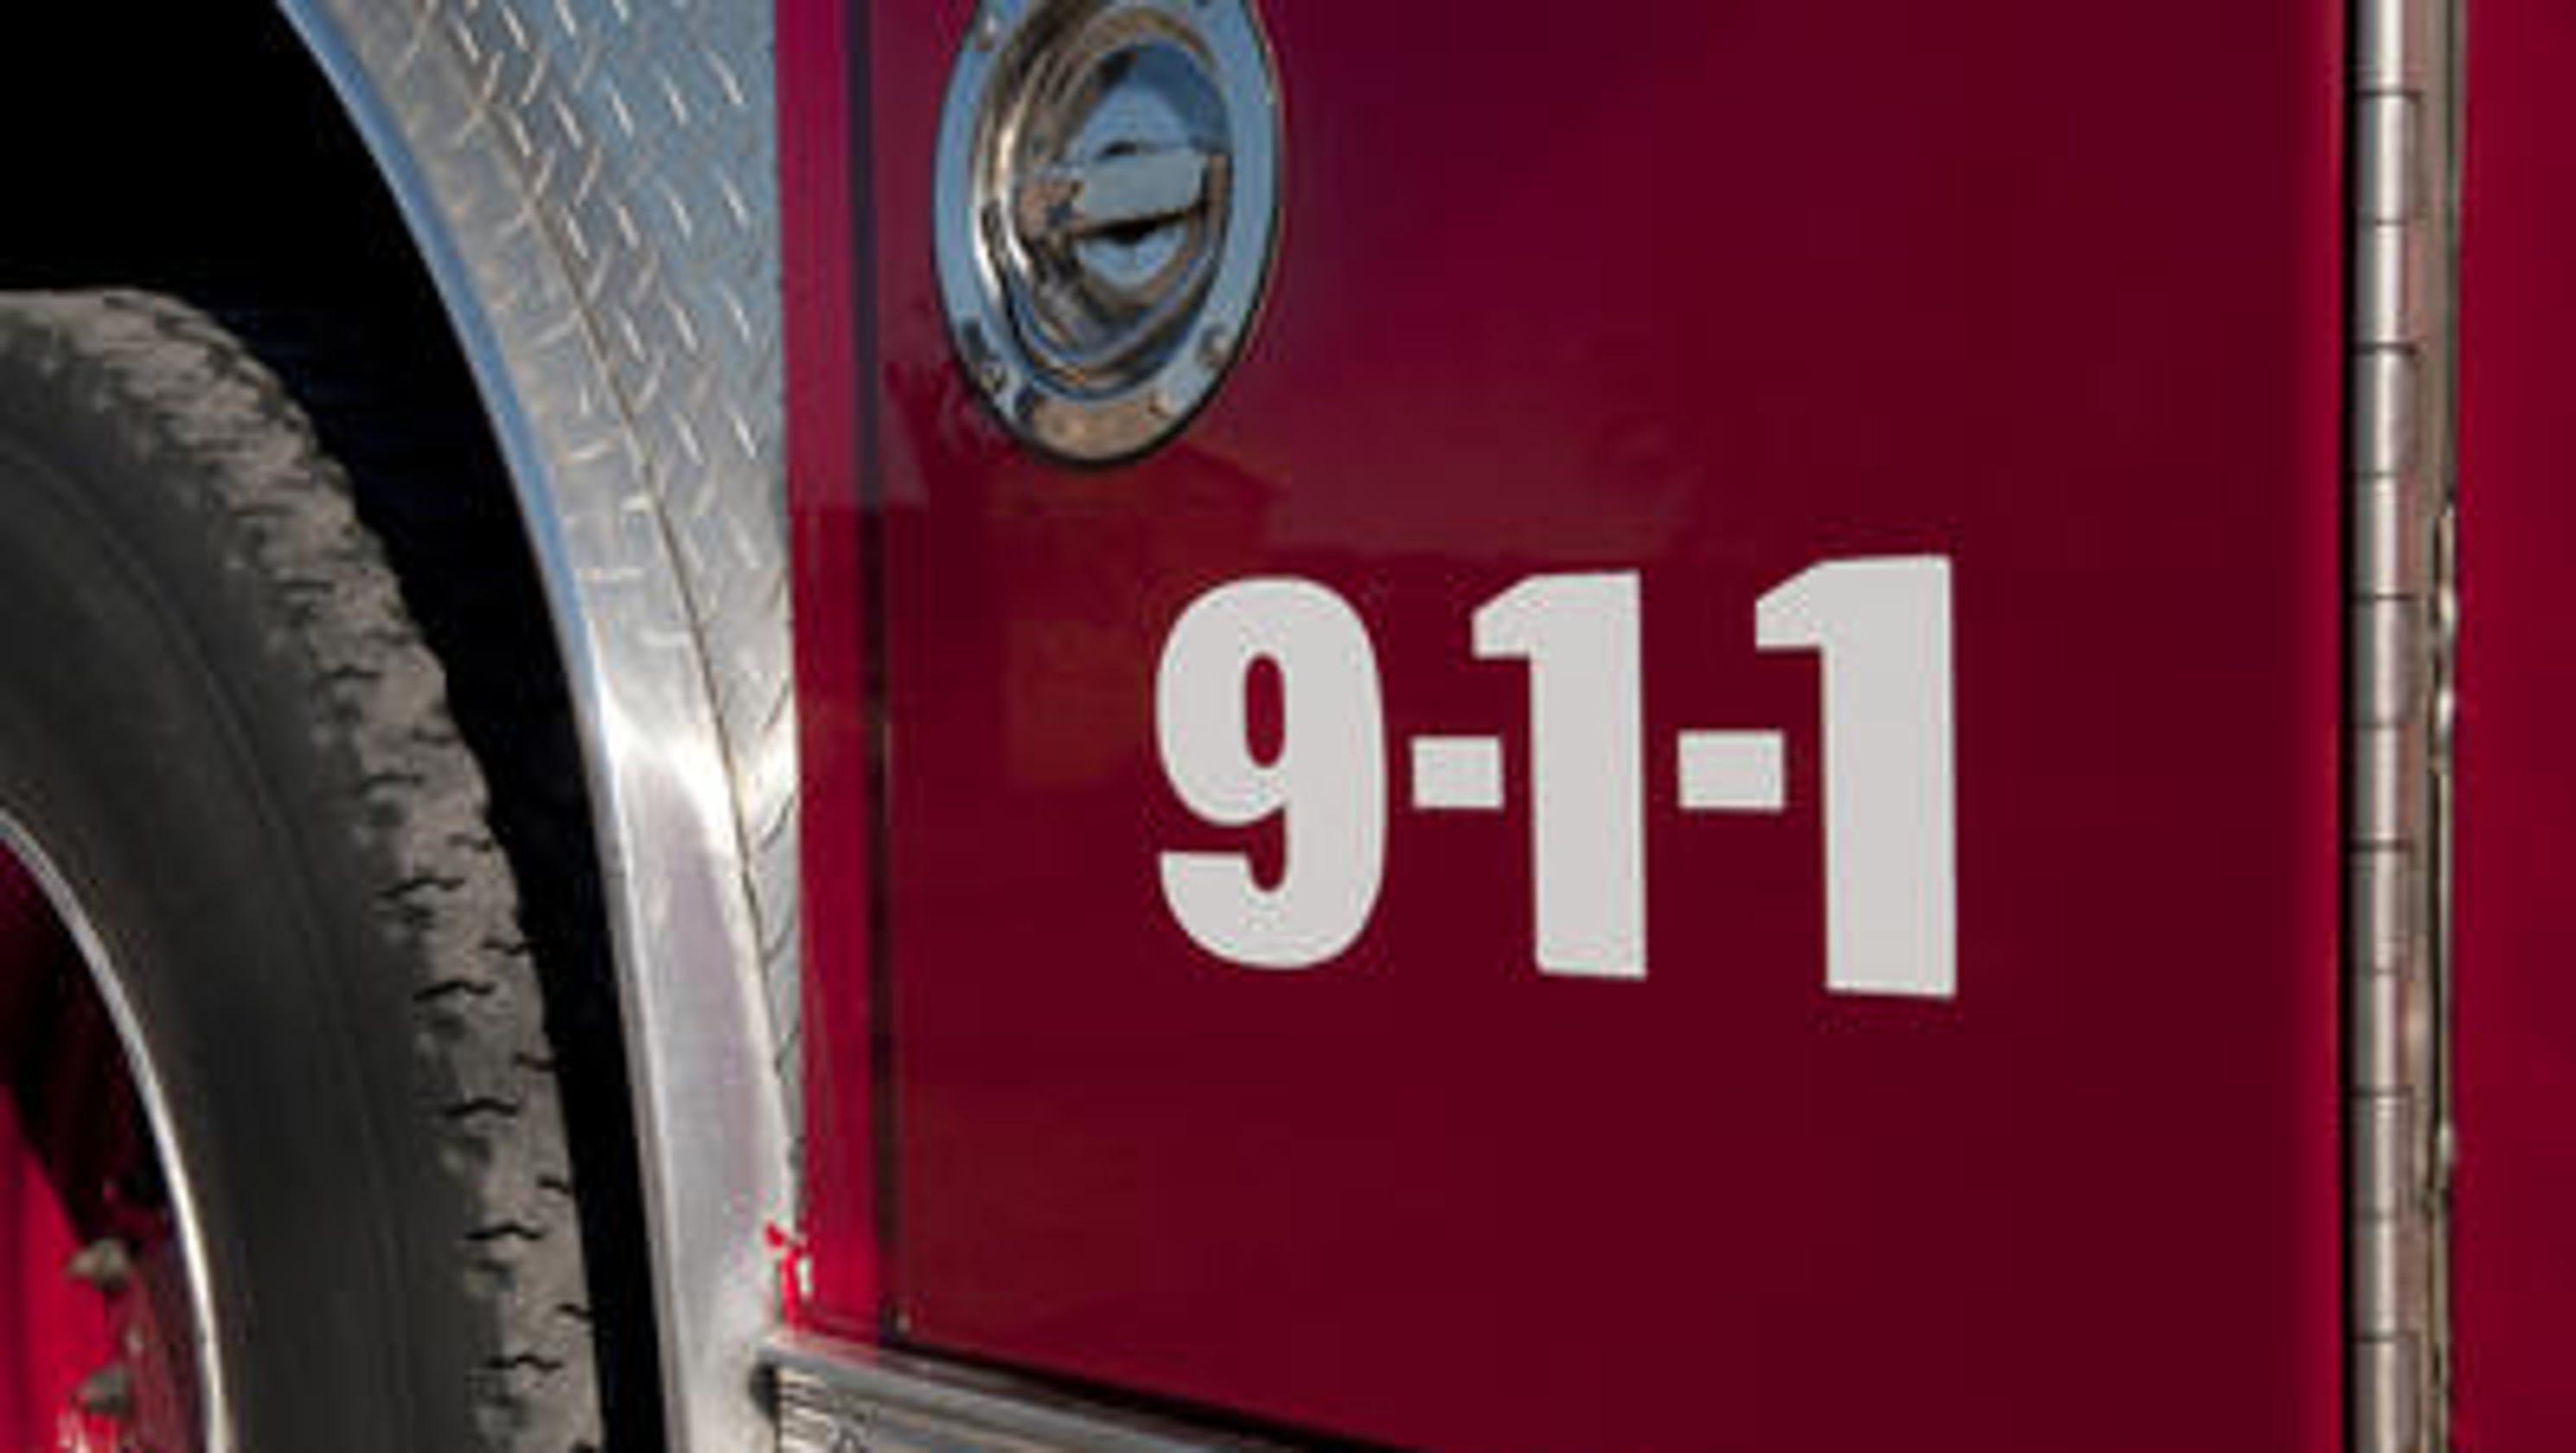 Early morning fire destroys Saratoga home Thursday